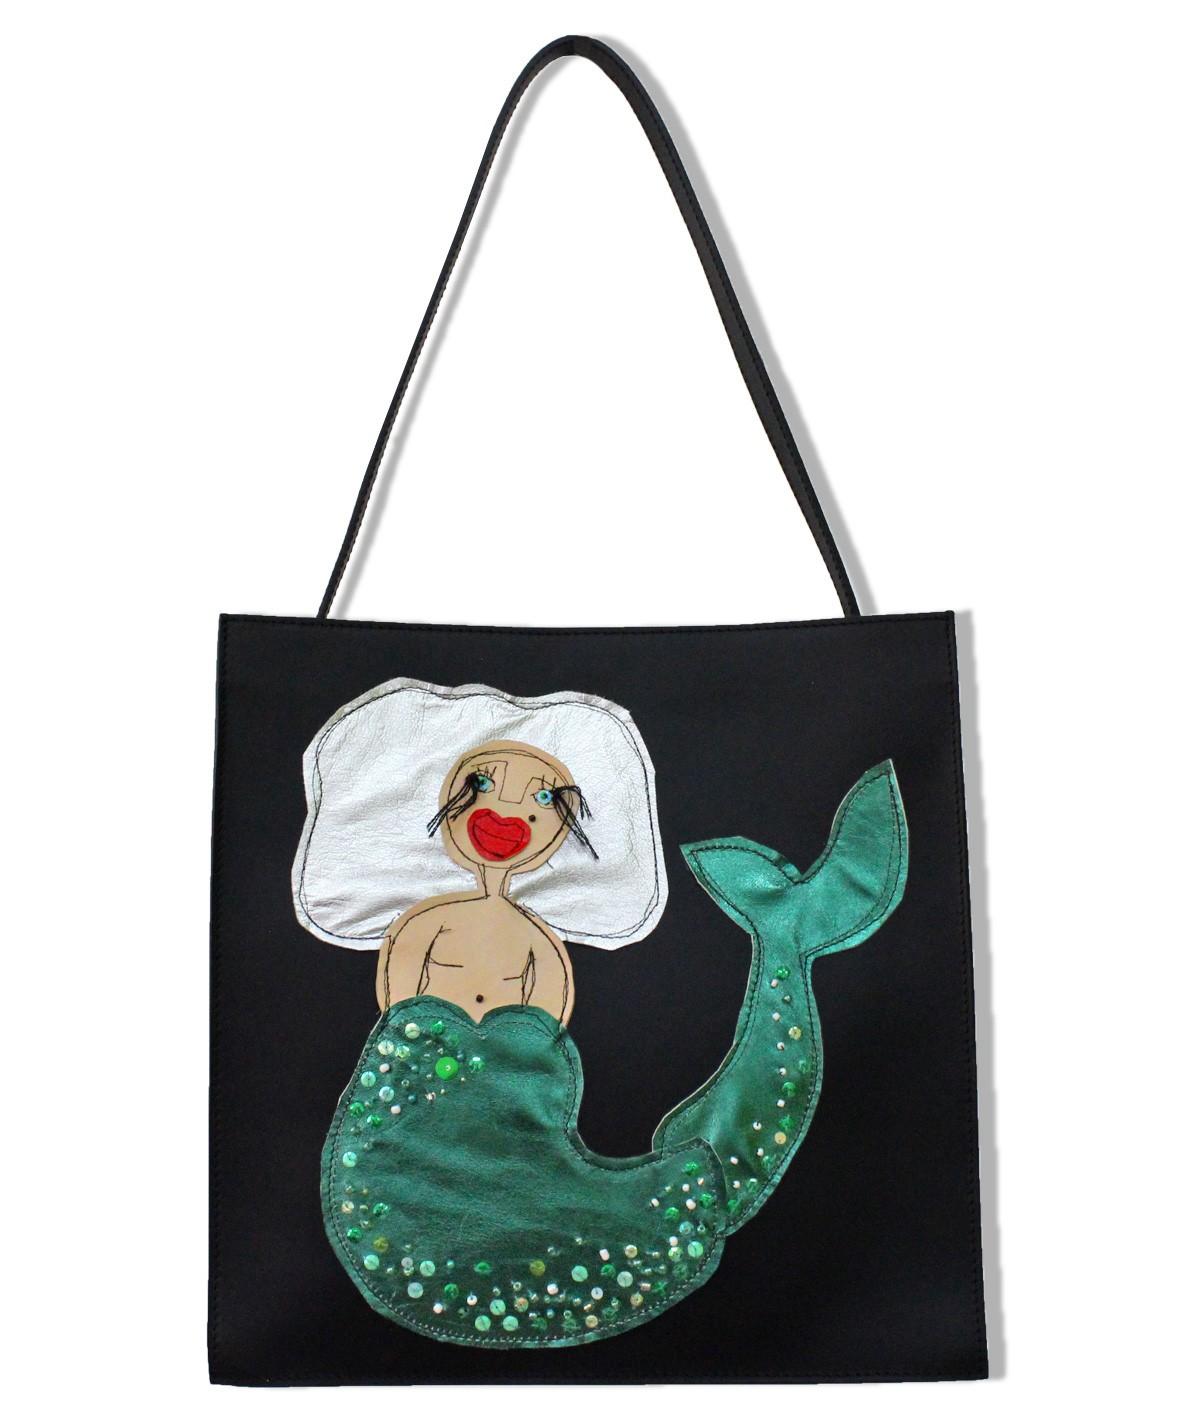 Mermaid - maxi leather bag